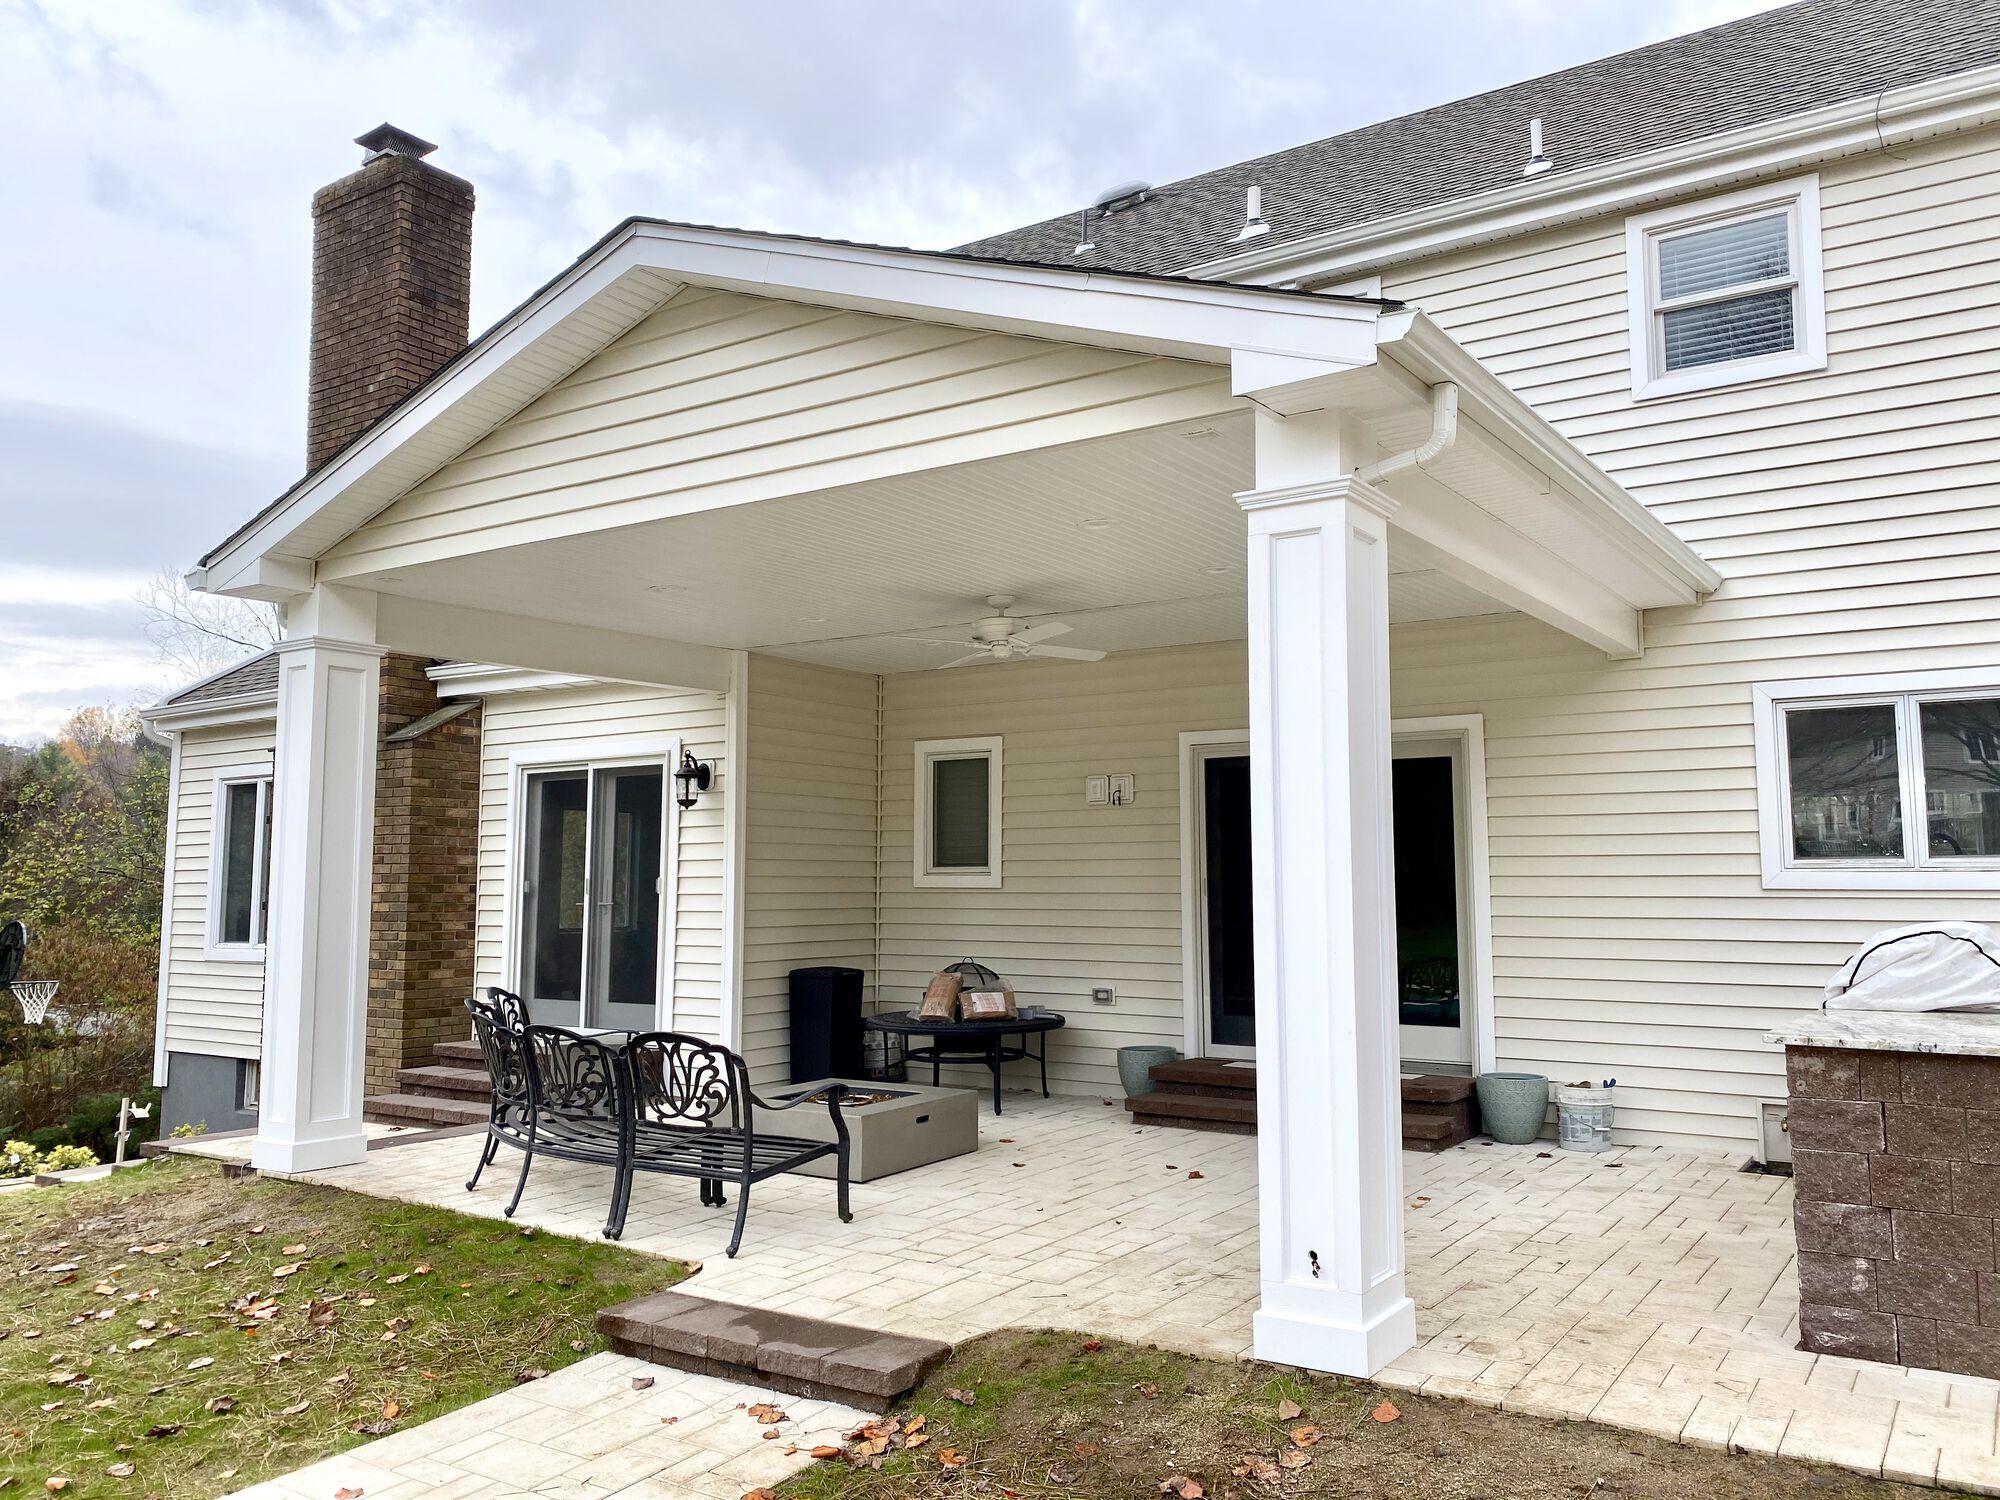 Portico Roof Build, Charter Oak Clapboard Vinyl Siding, Paver Patio in Upper Saddle River, Bergen County NJ